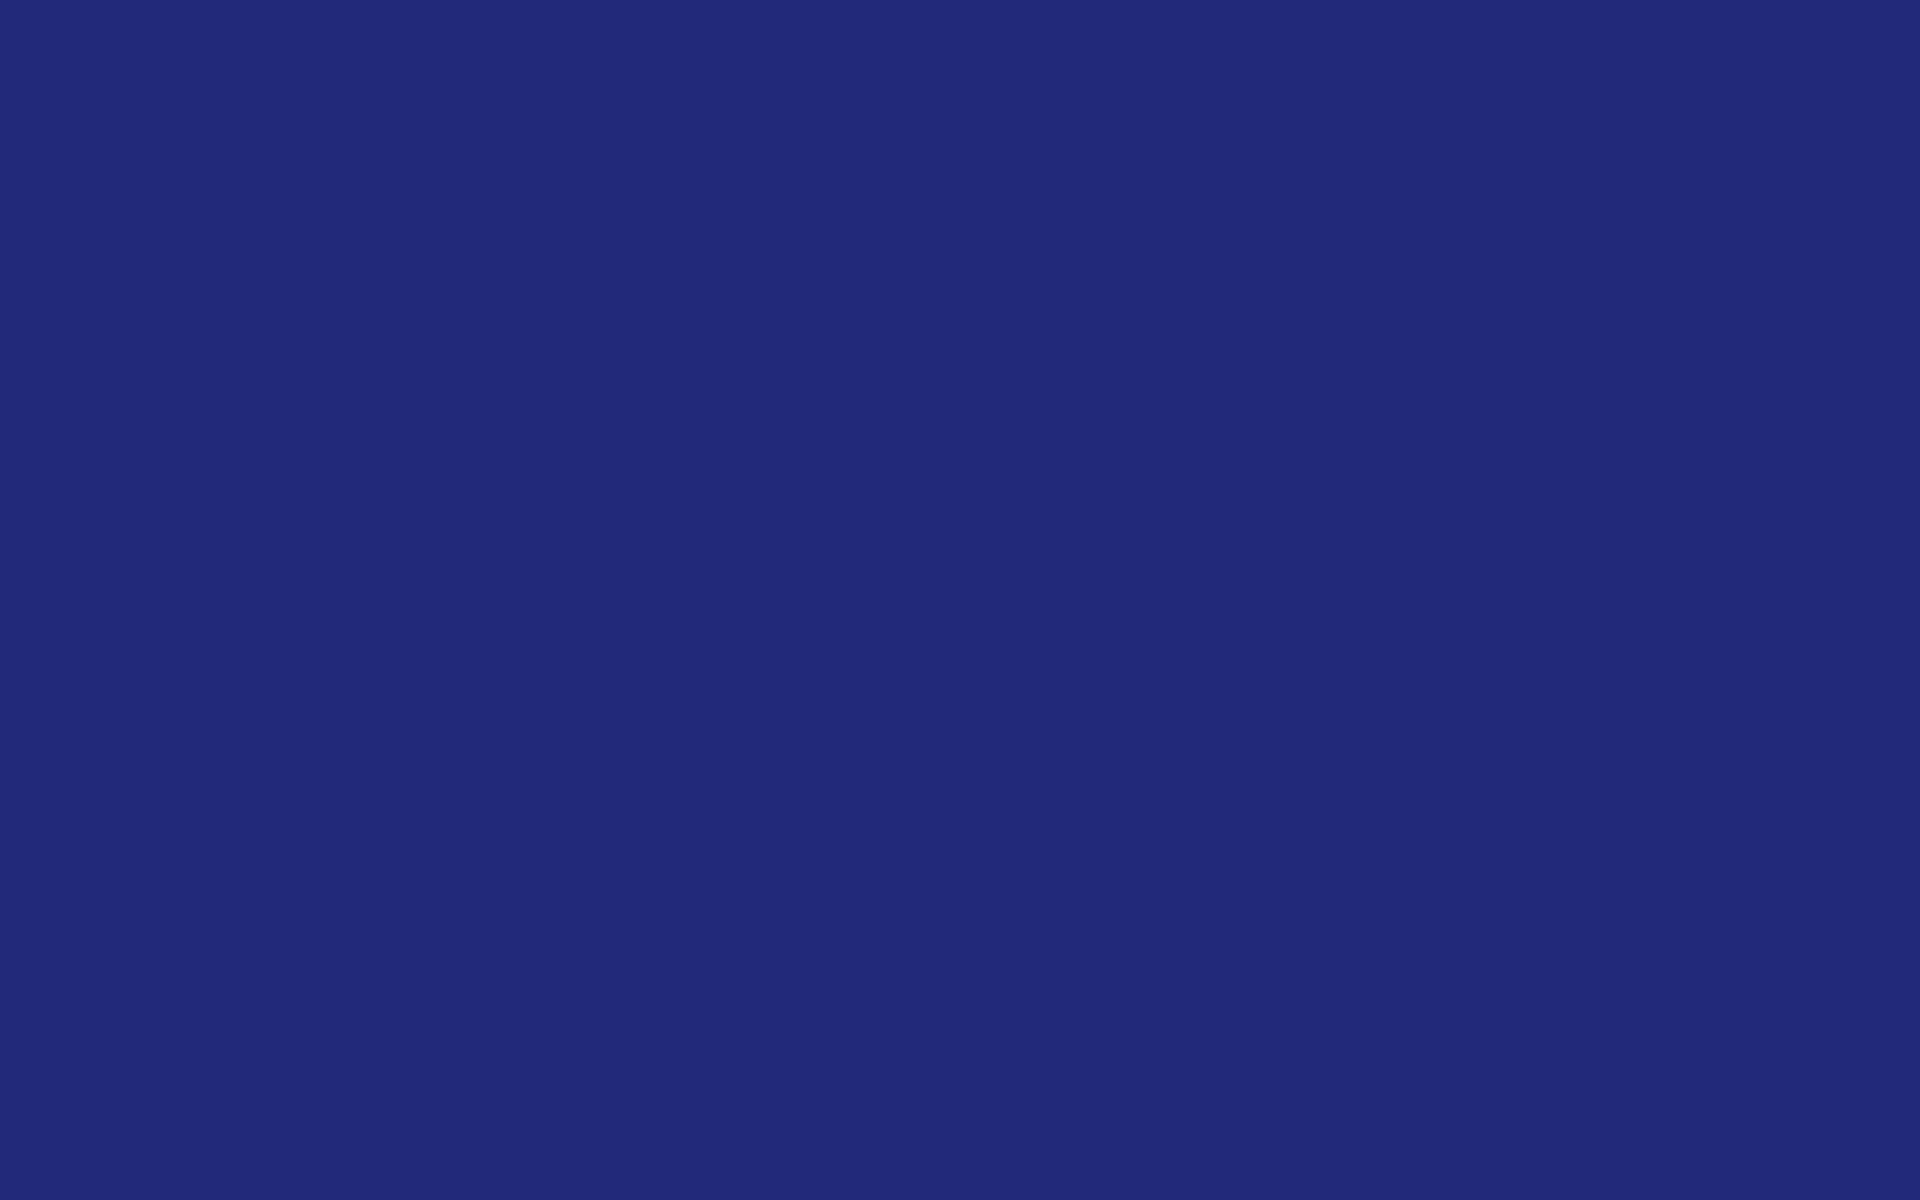 1920x1200 St Patricks Blue Solid Color Background